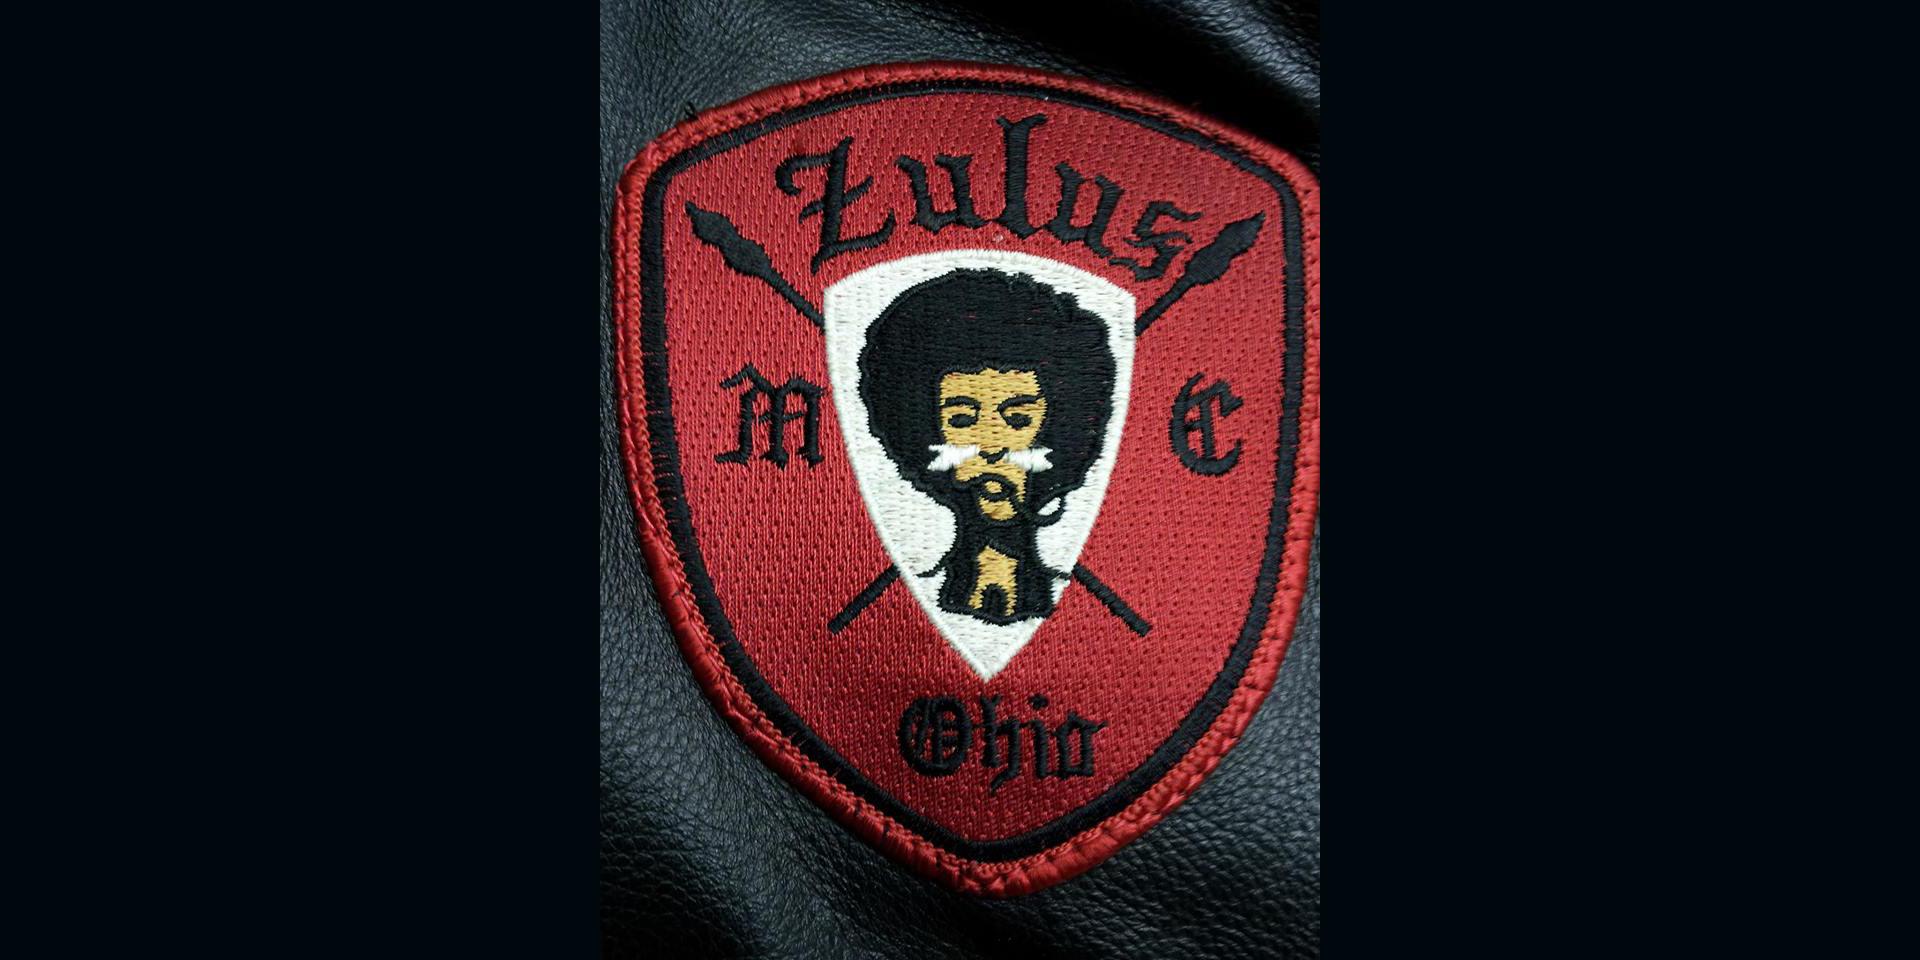 Zulus Mc Motorcycle Club One